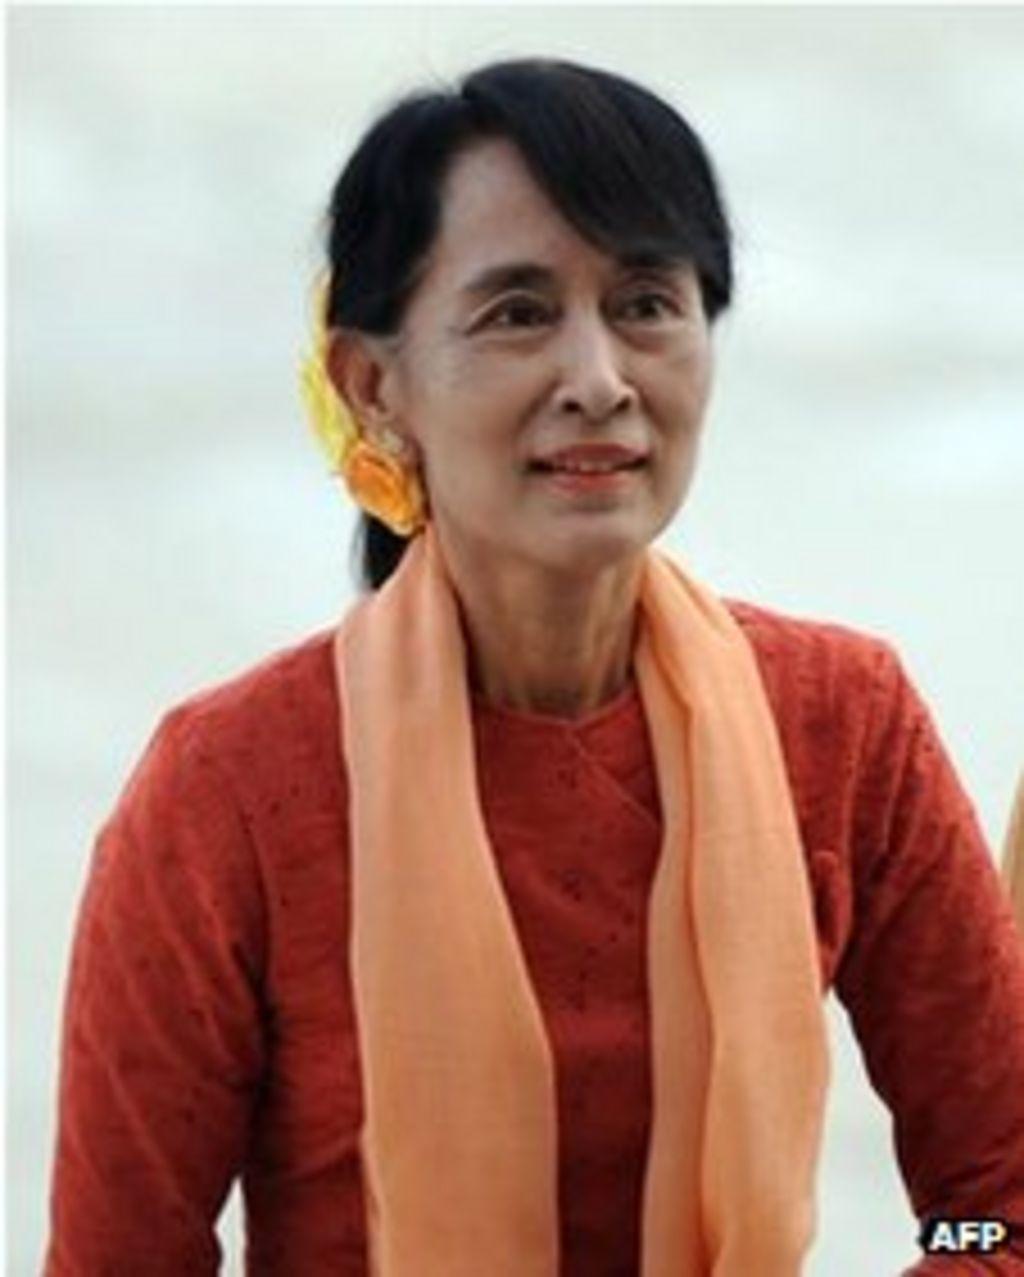 Aung San Suu Kyi The Voice Of Hope  amazoncom